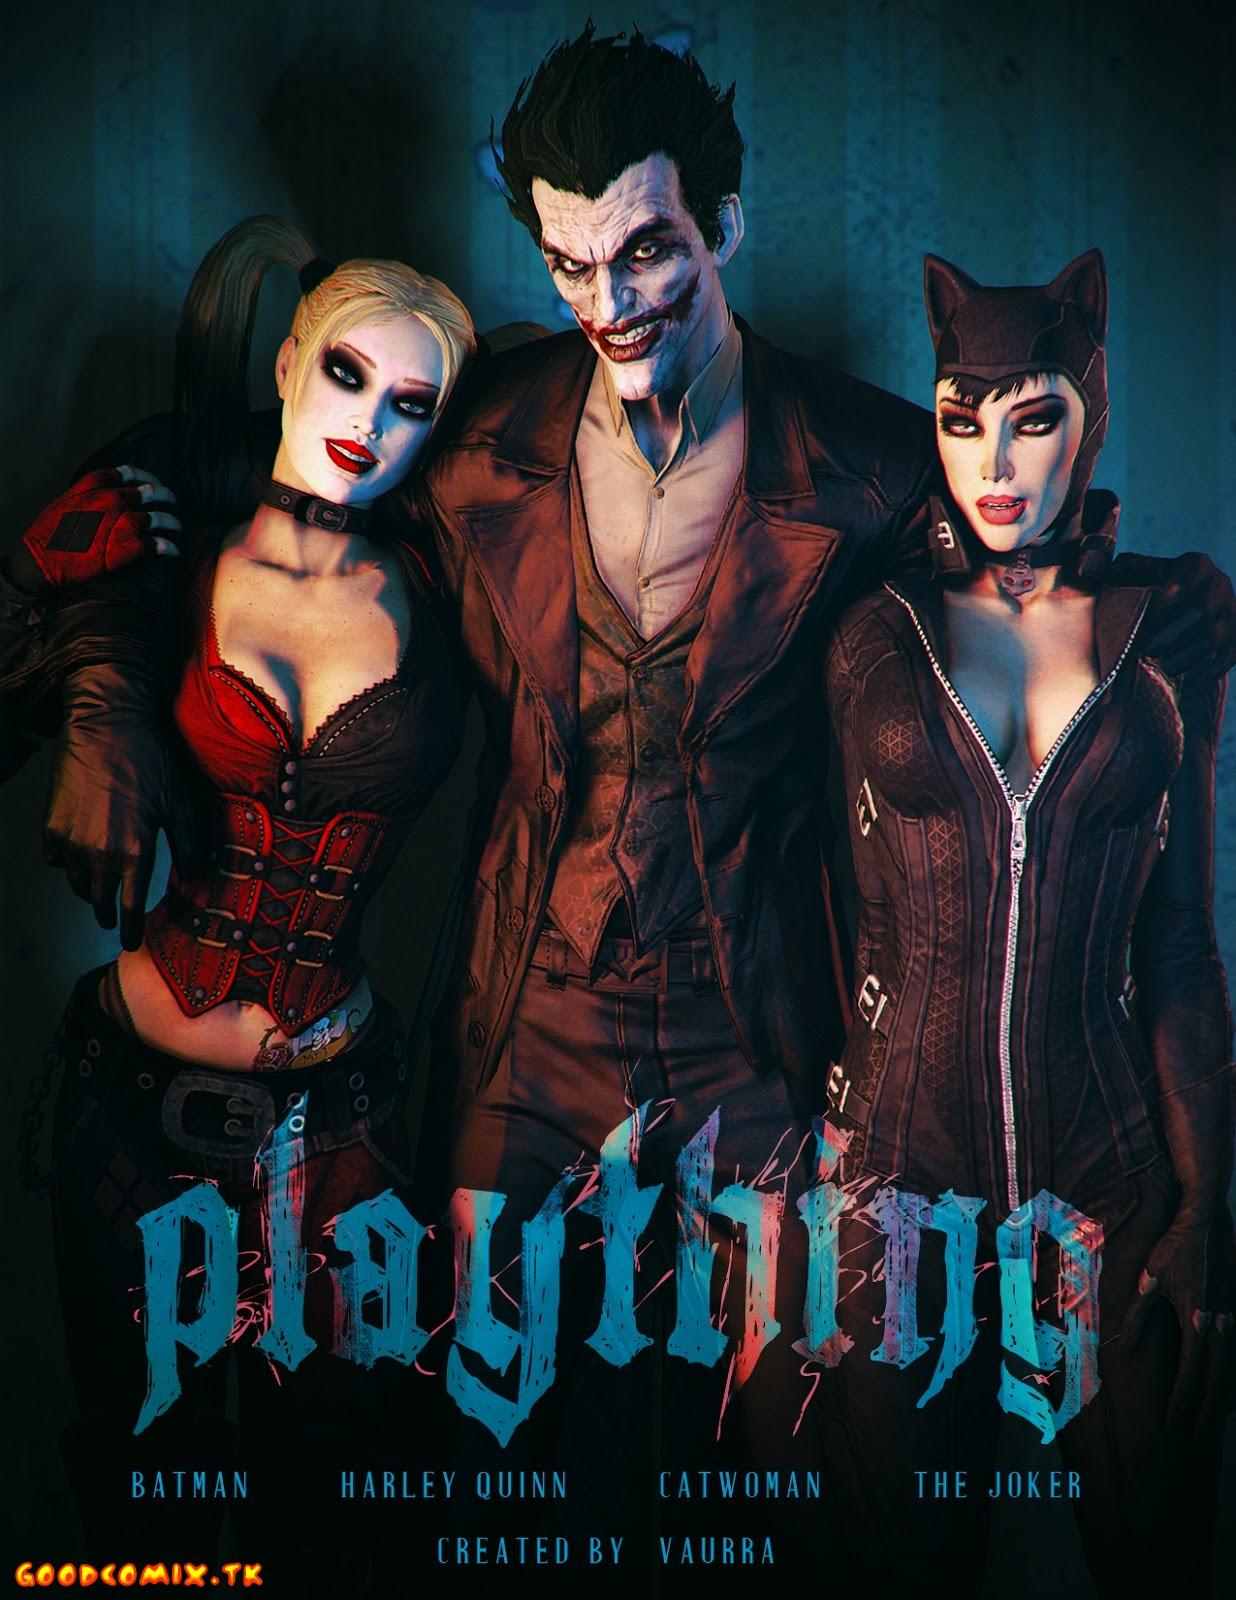 Goodcomix Batman - [Vaurra] - Plaything